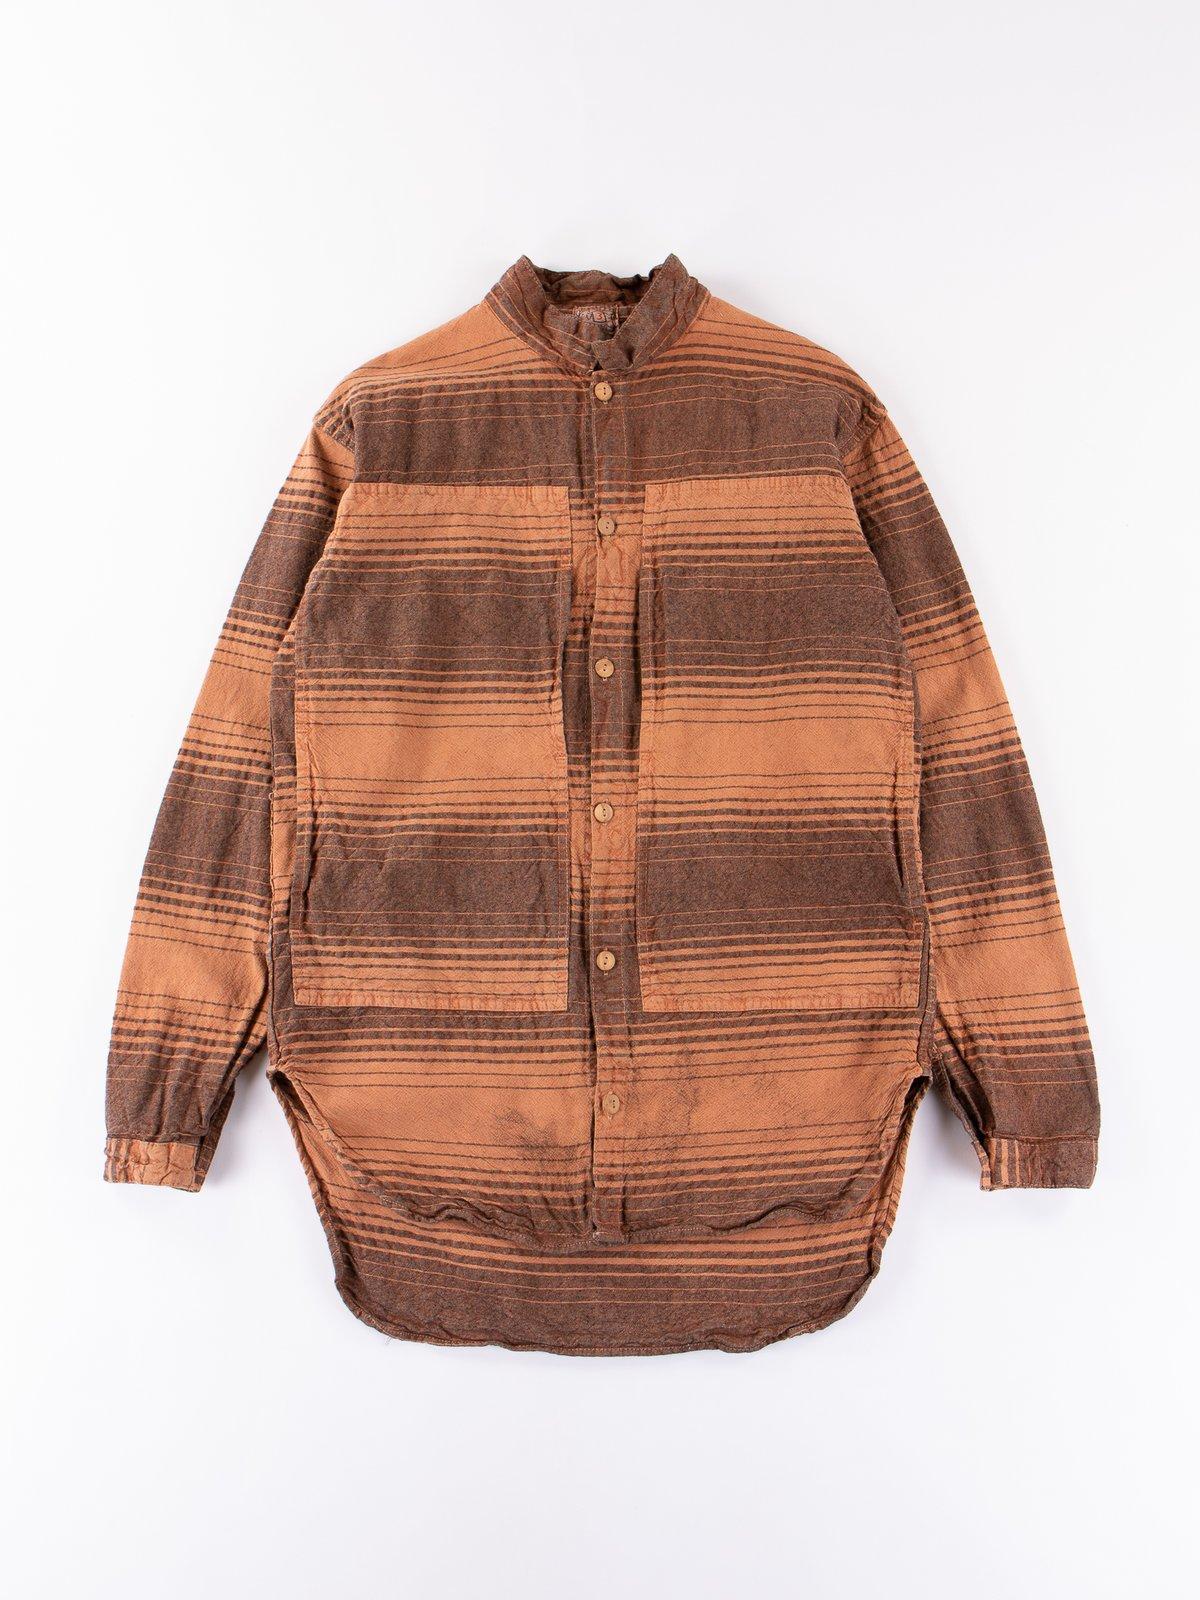 Red Ochre Dye Indigo Doppler Stripe Calico Periscope Pocket Tail Shirt - Image 1